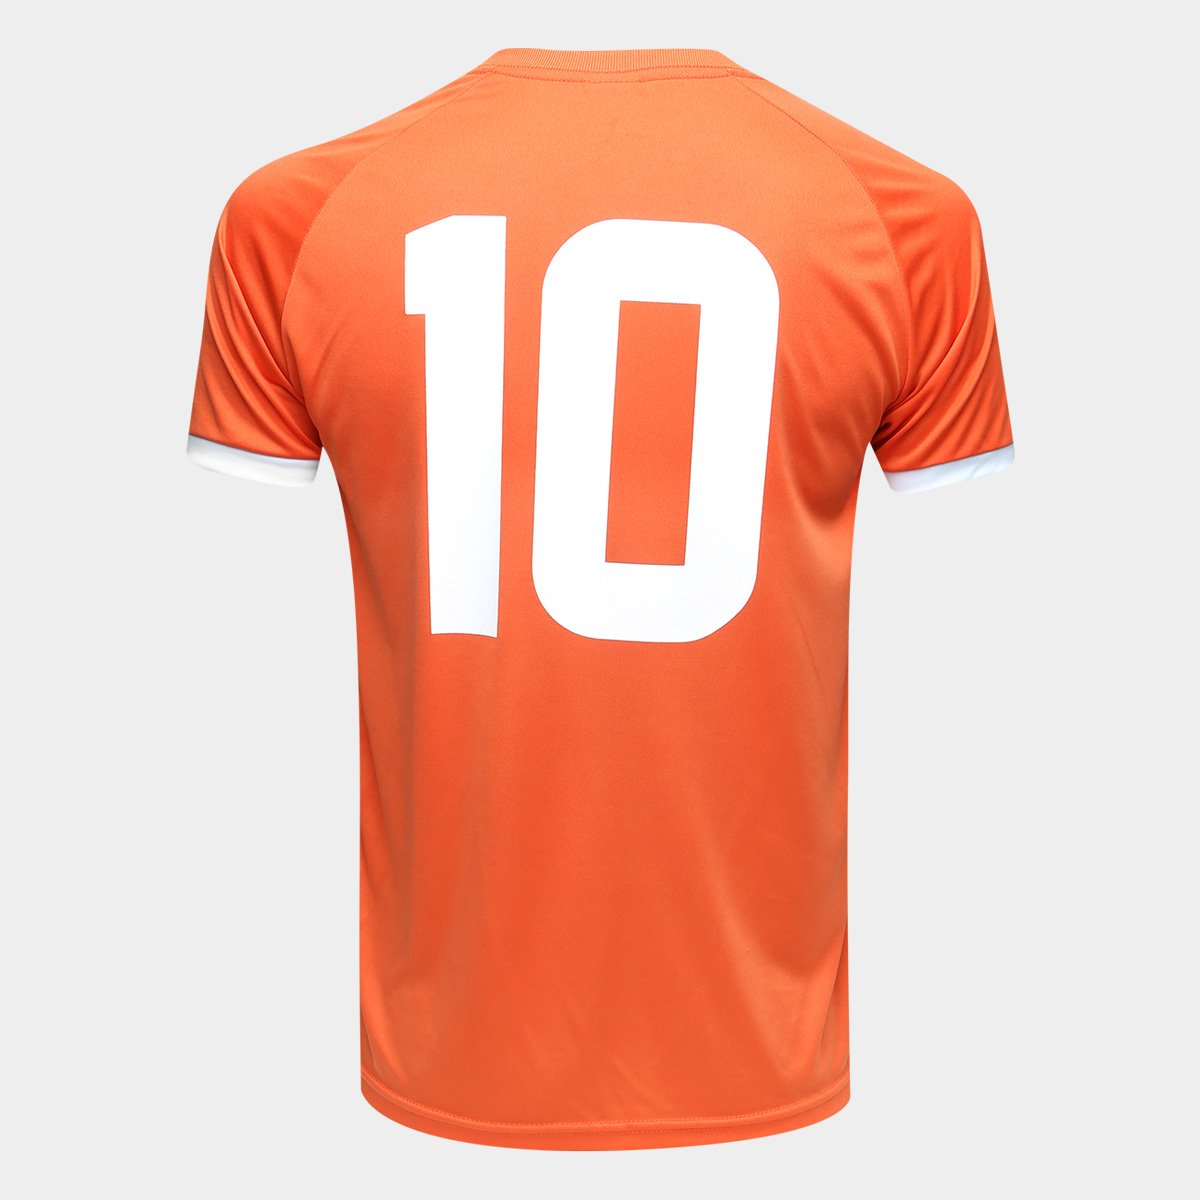 Camisa Holanda 2002 n°10 Masculina - Compre Agora  bc9c393c5729b